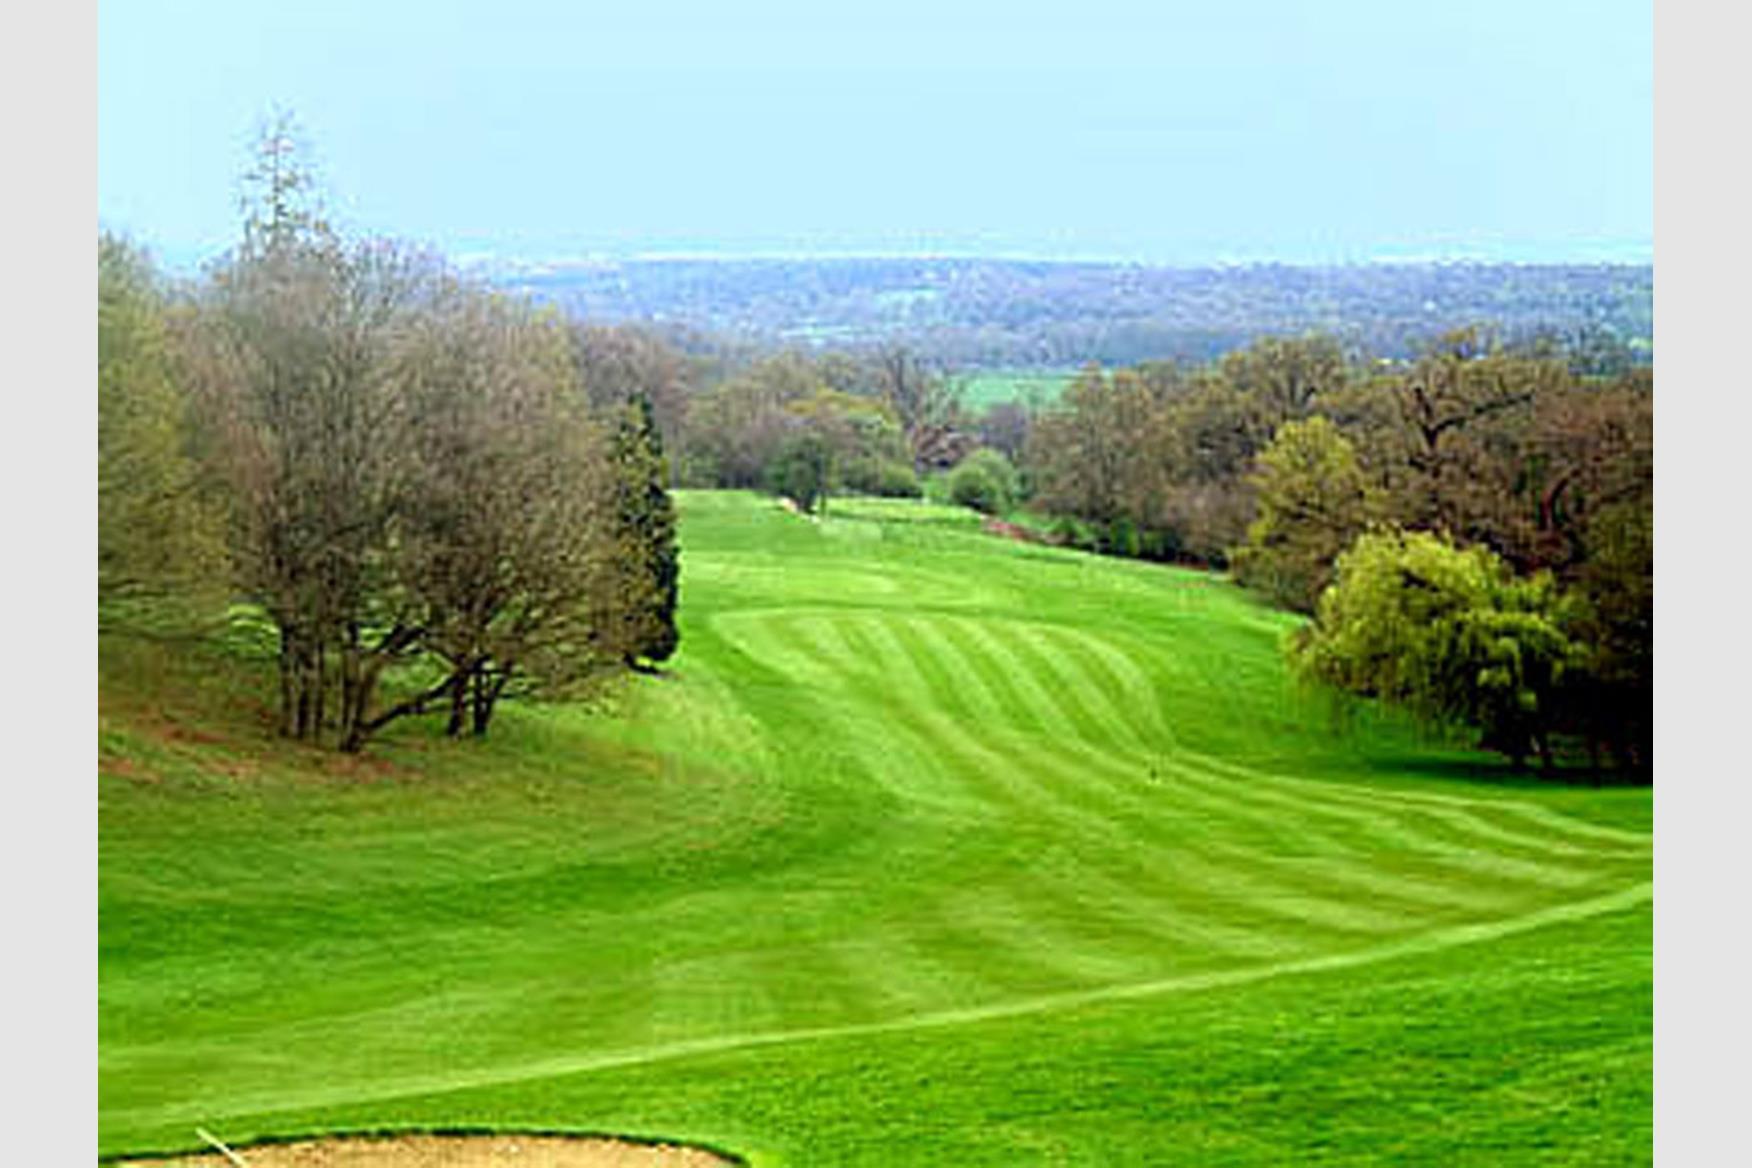 Dorking Golf Club Golf Course In Dorking Golf Course